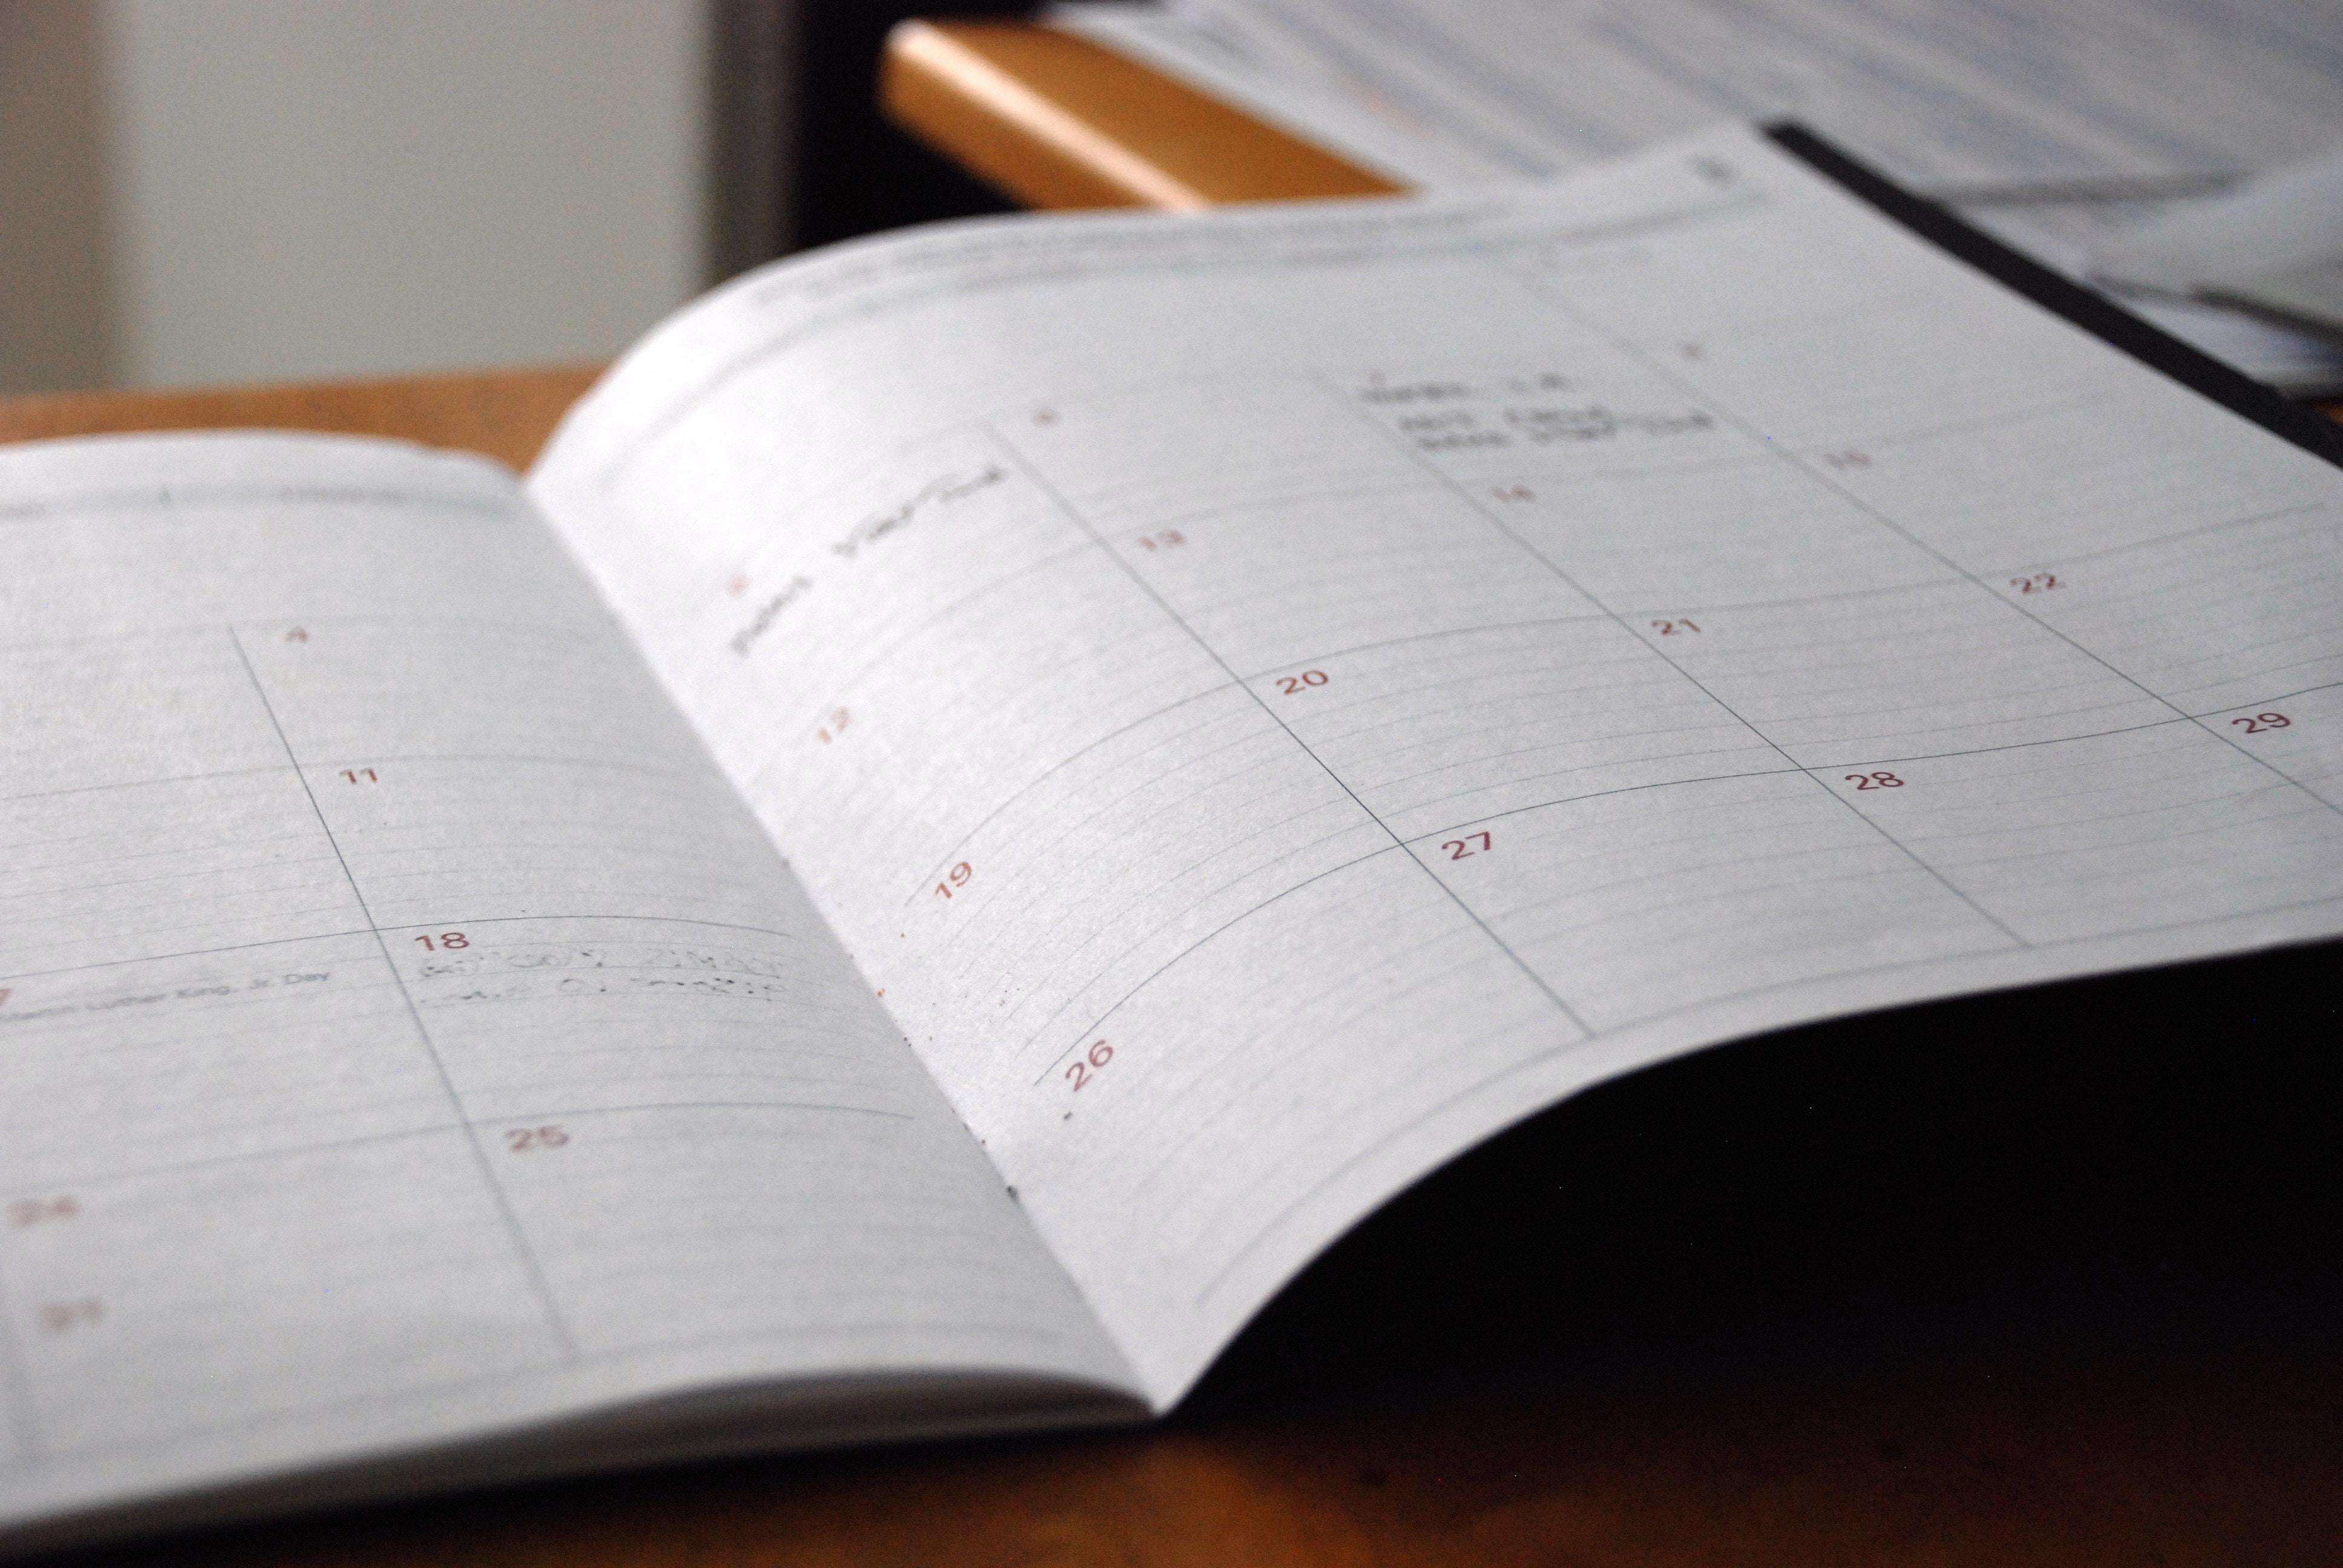 School Board Approves 2019-20 School Year Calendar